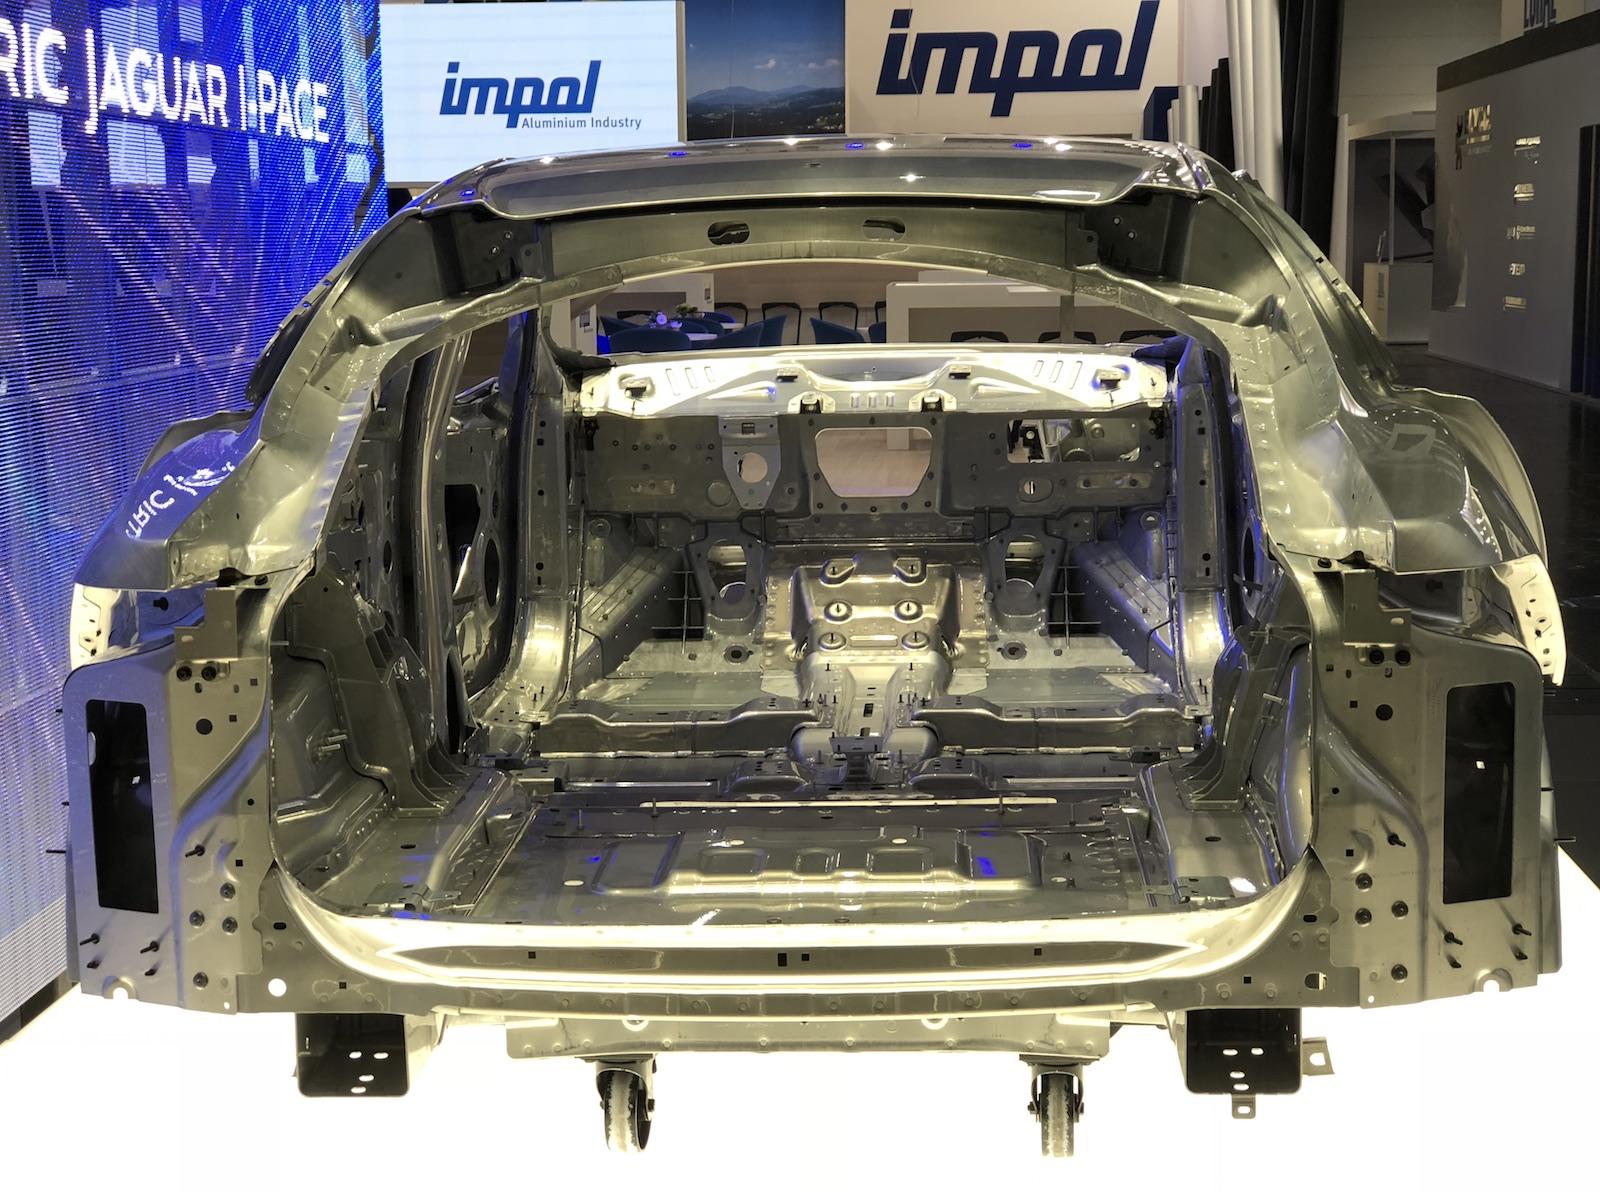 A view inside the Jaguar I-PACE architecture.